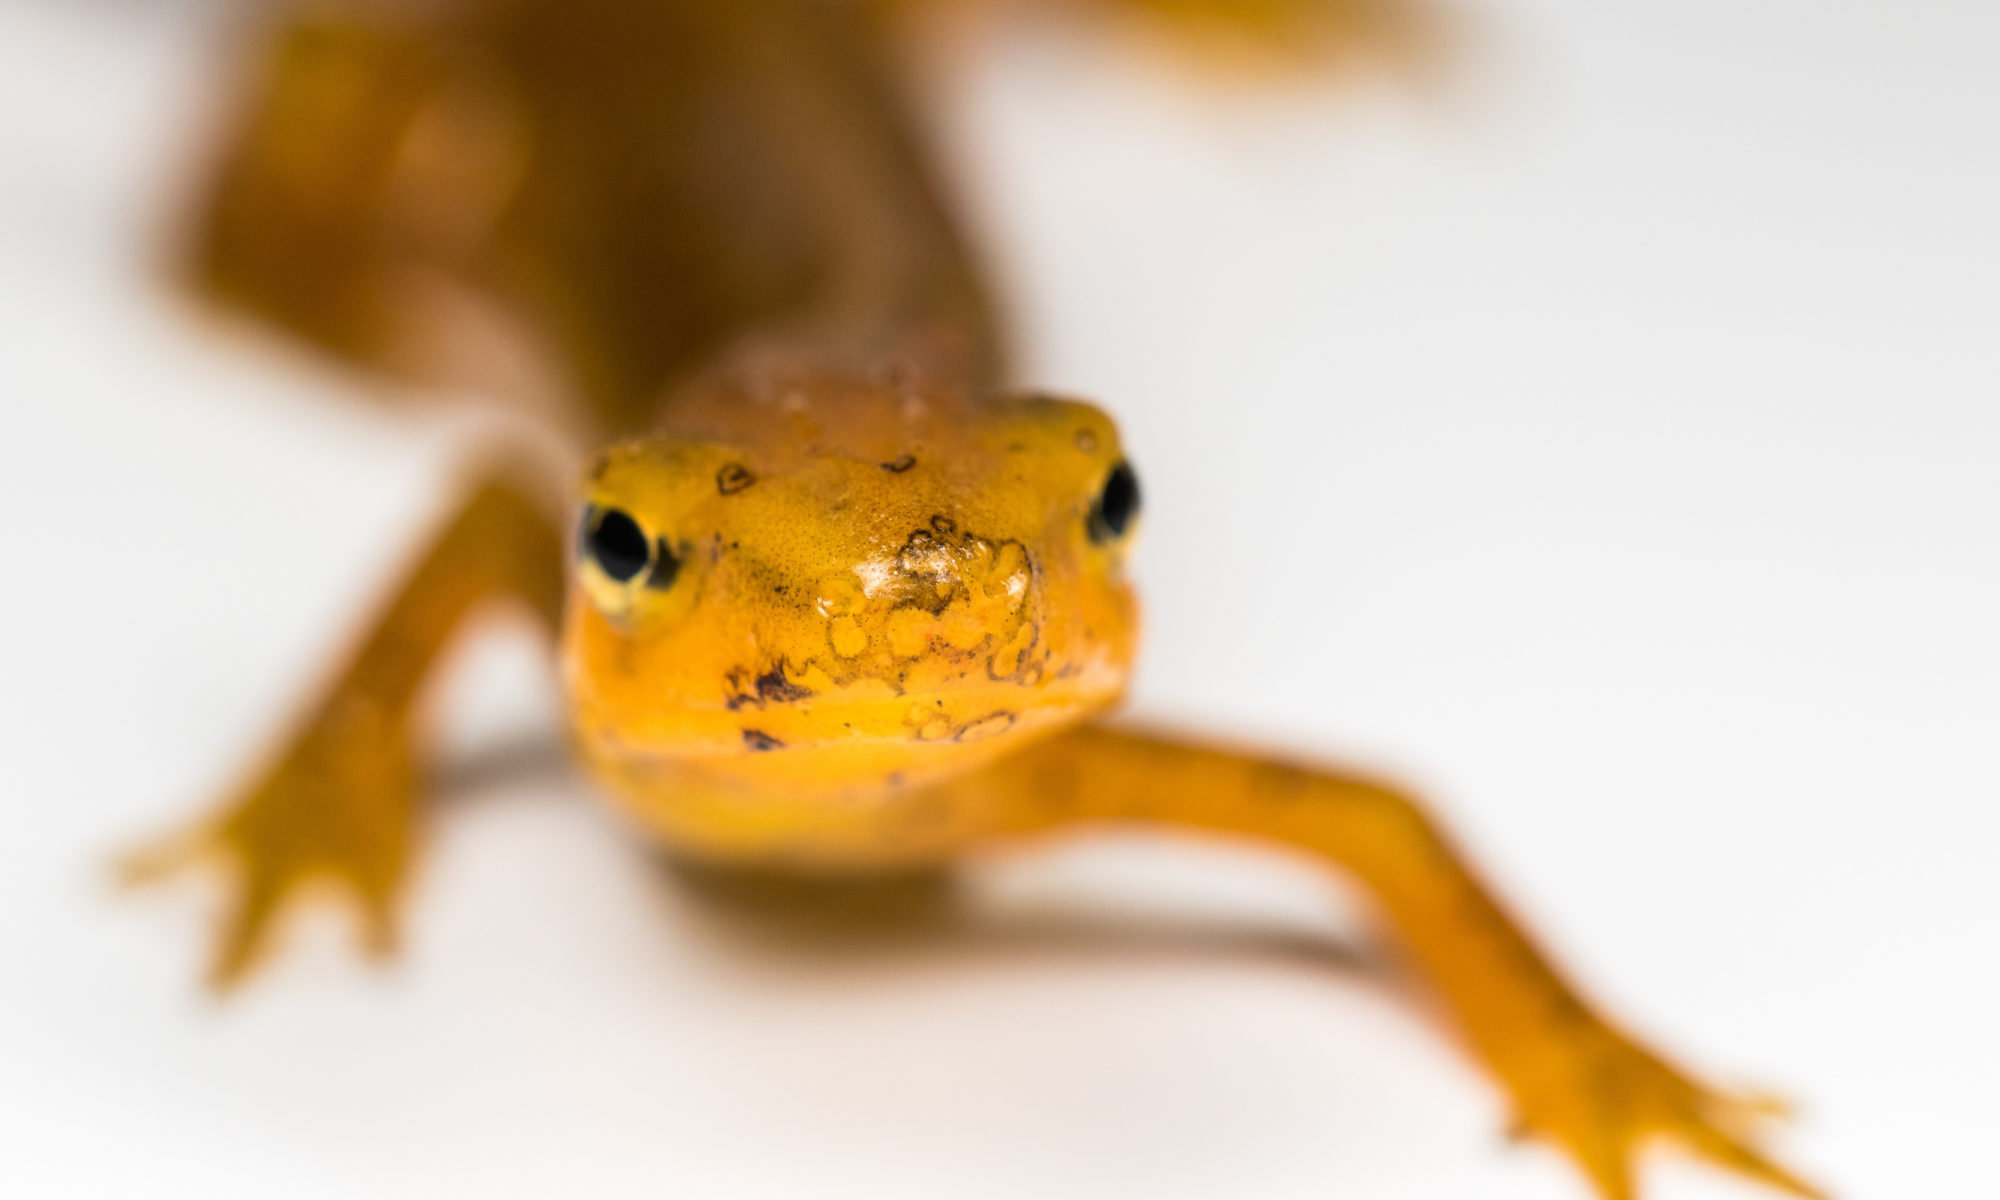 An eastern newt shows signs of Bsal pathogen on its nose.